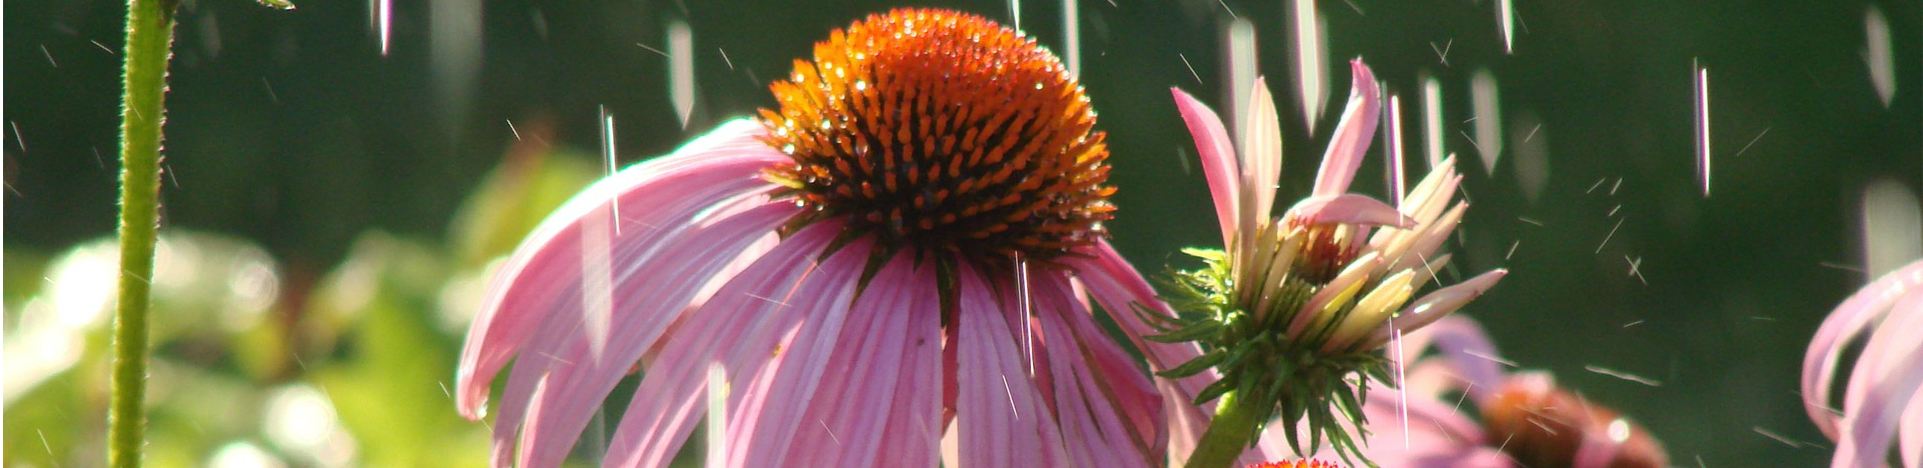 Třapatka-nachová-Echinacea-purpurea